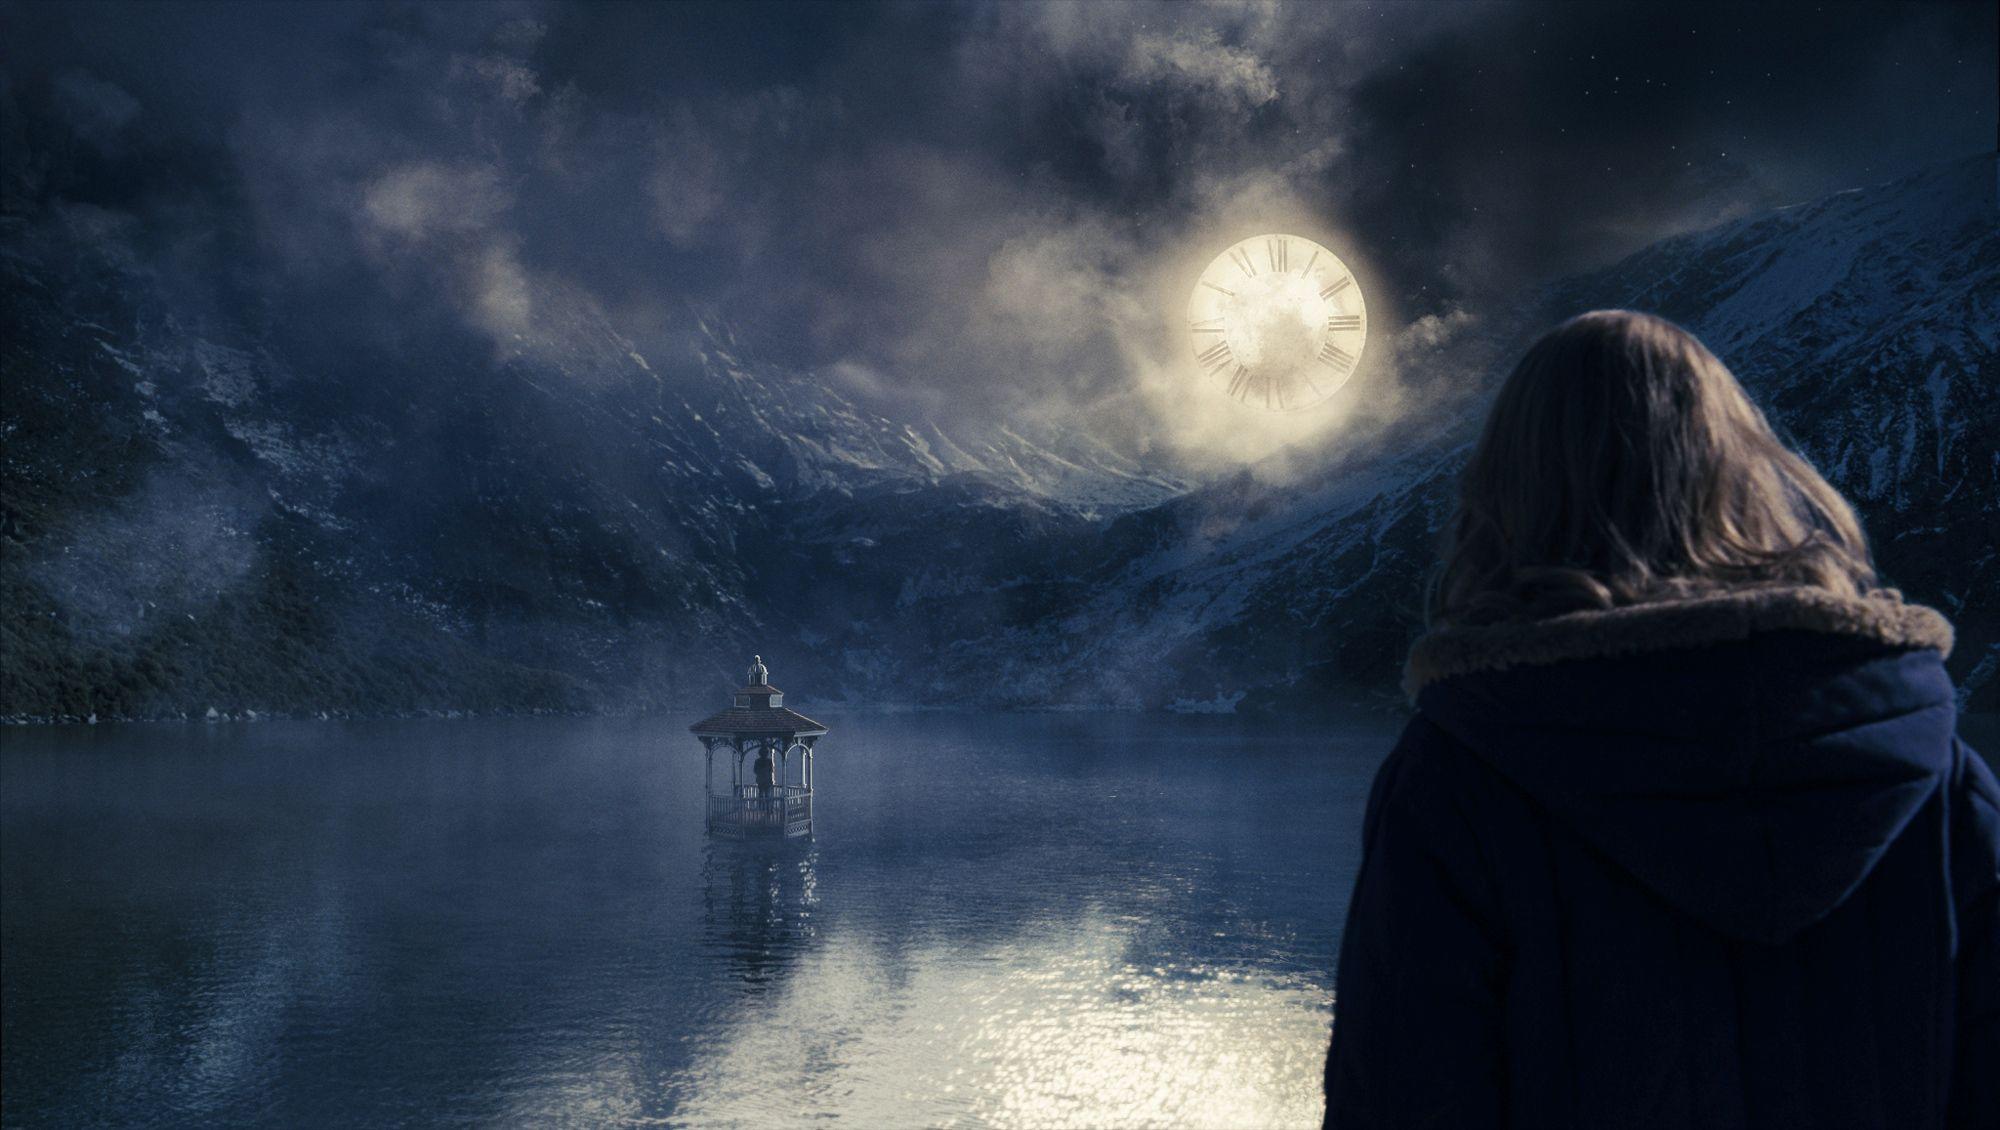 Alice sebolds concept of heaven